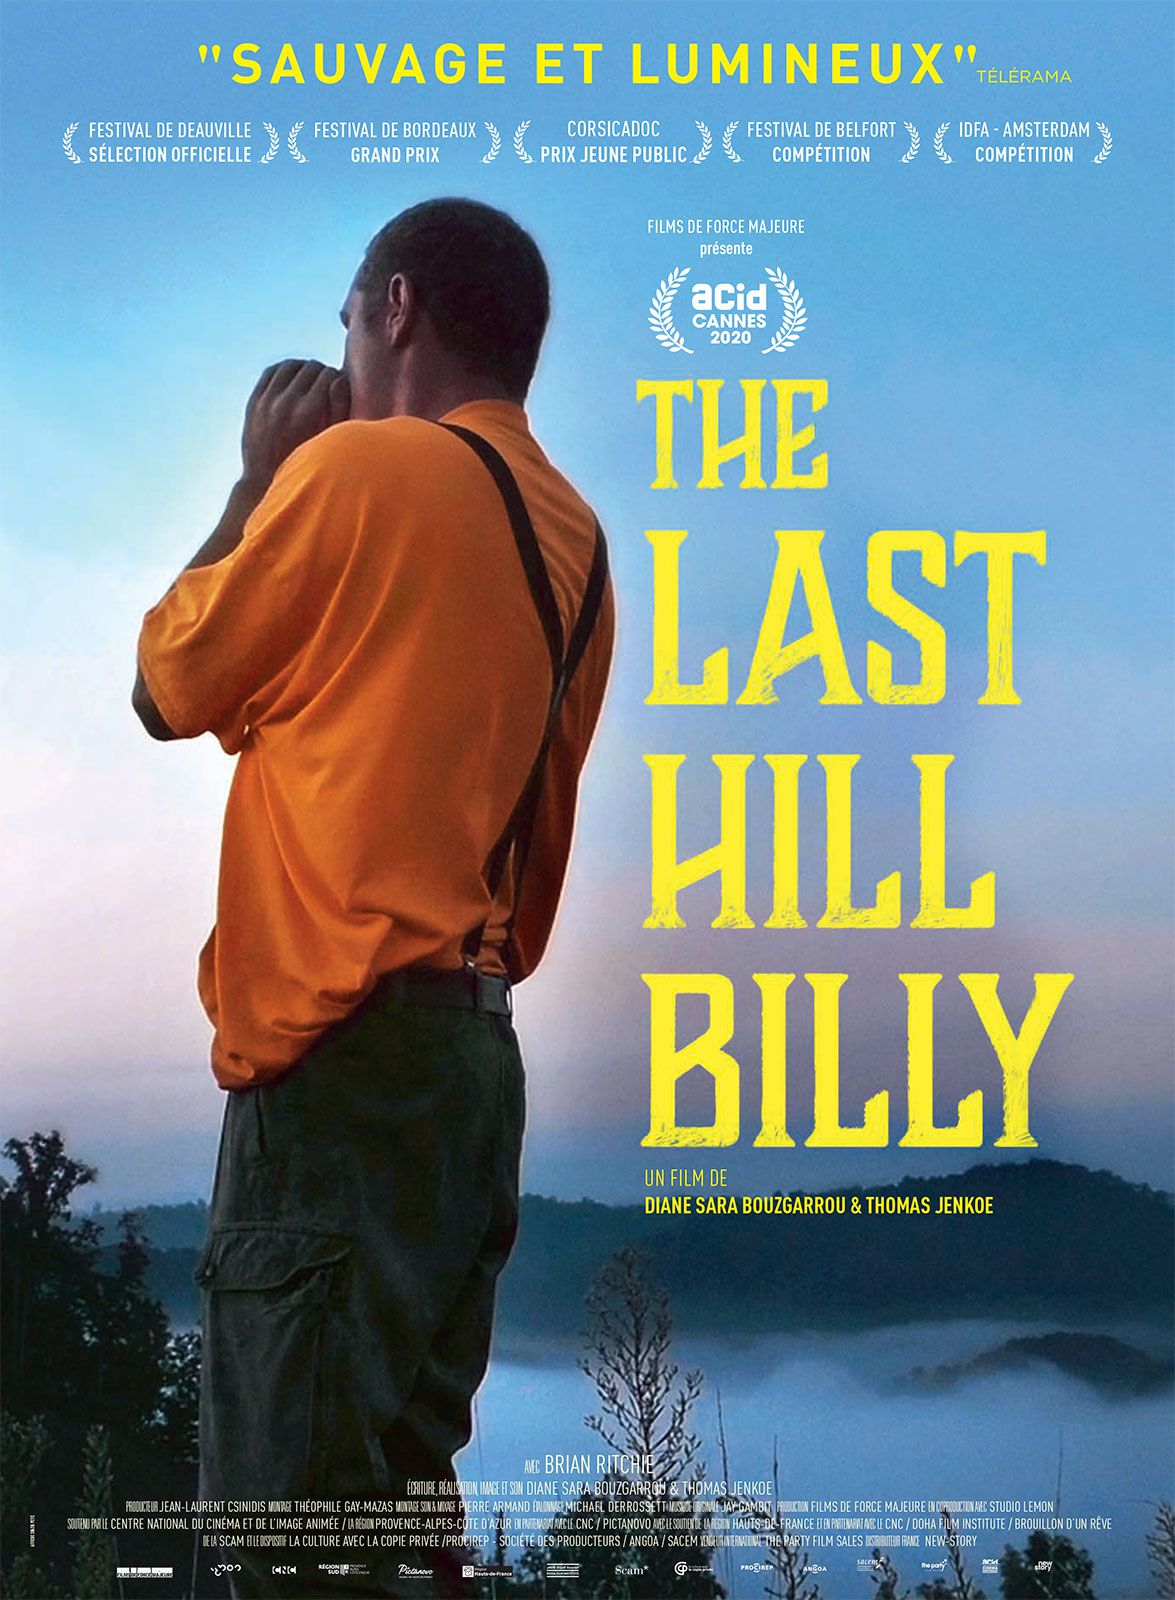 The Last Hillbilly - Documentaire (2020)